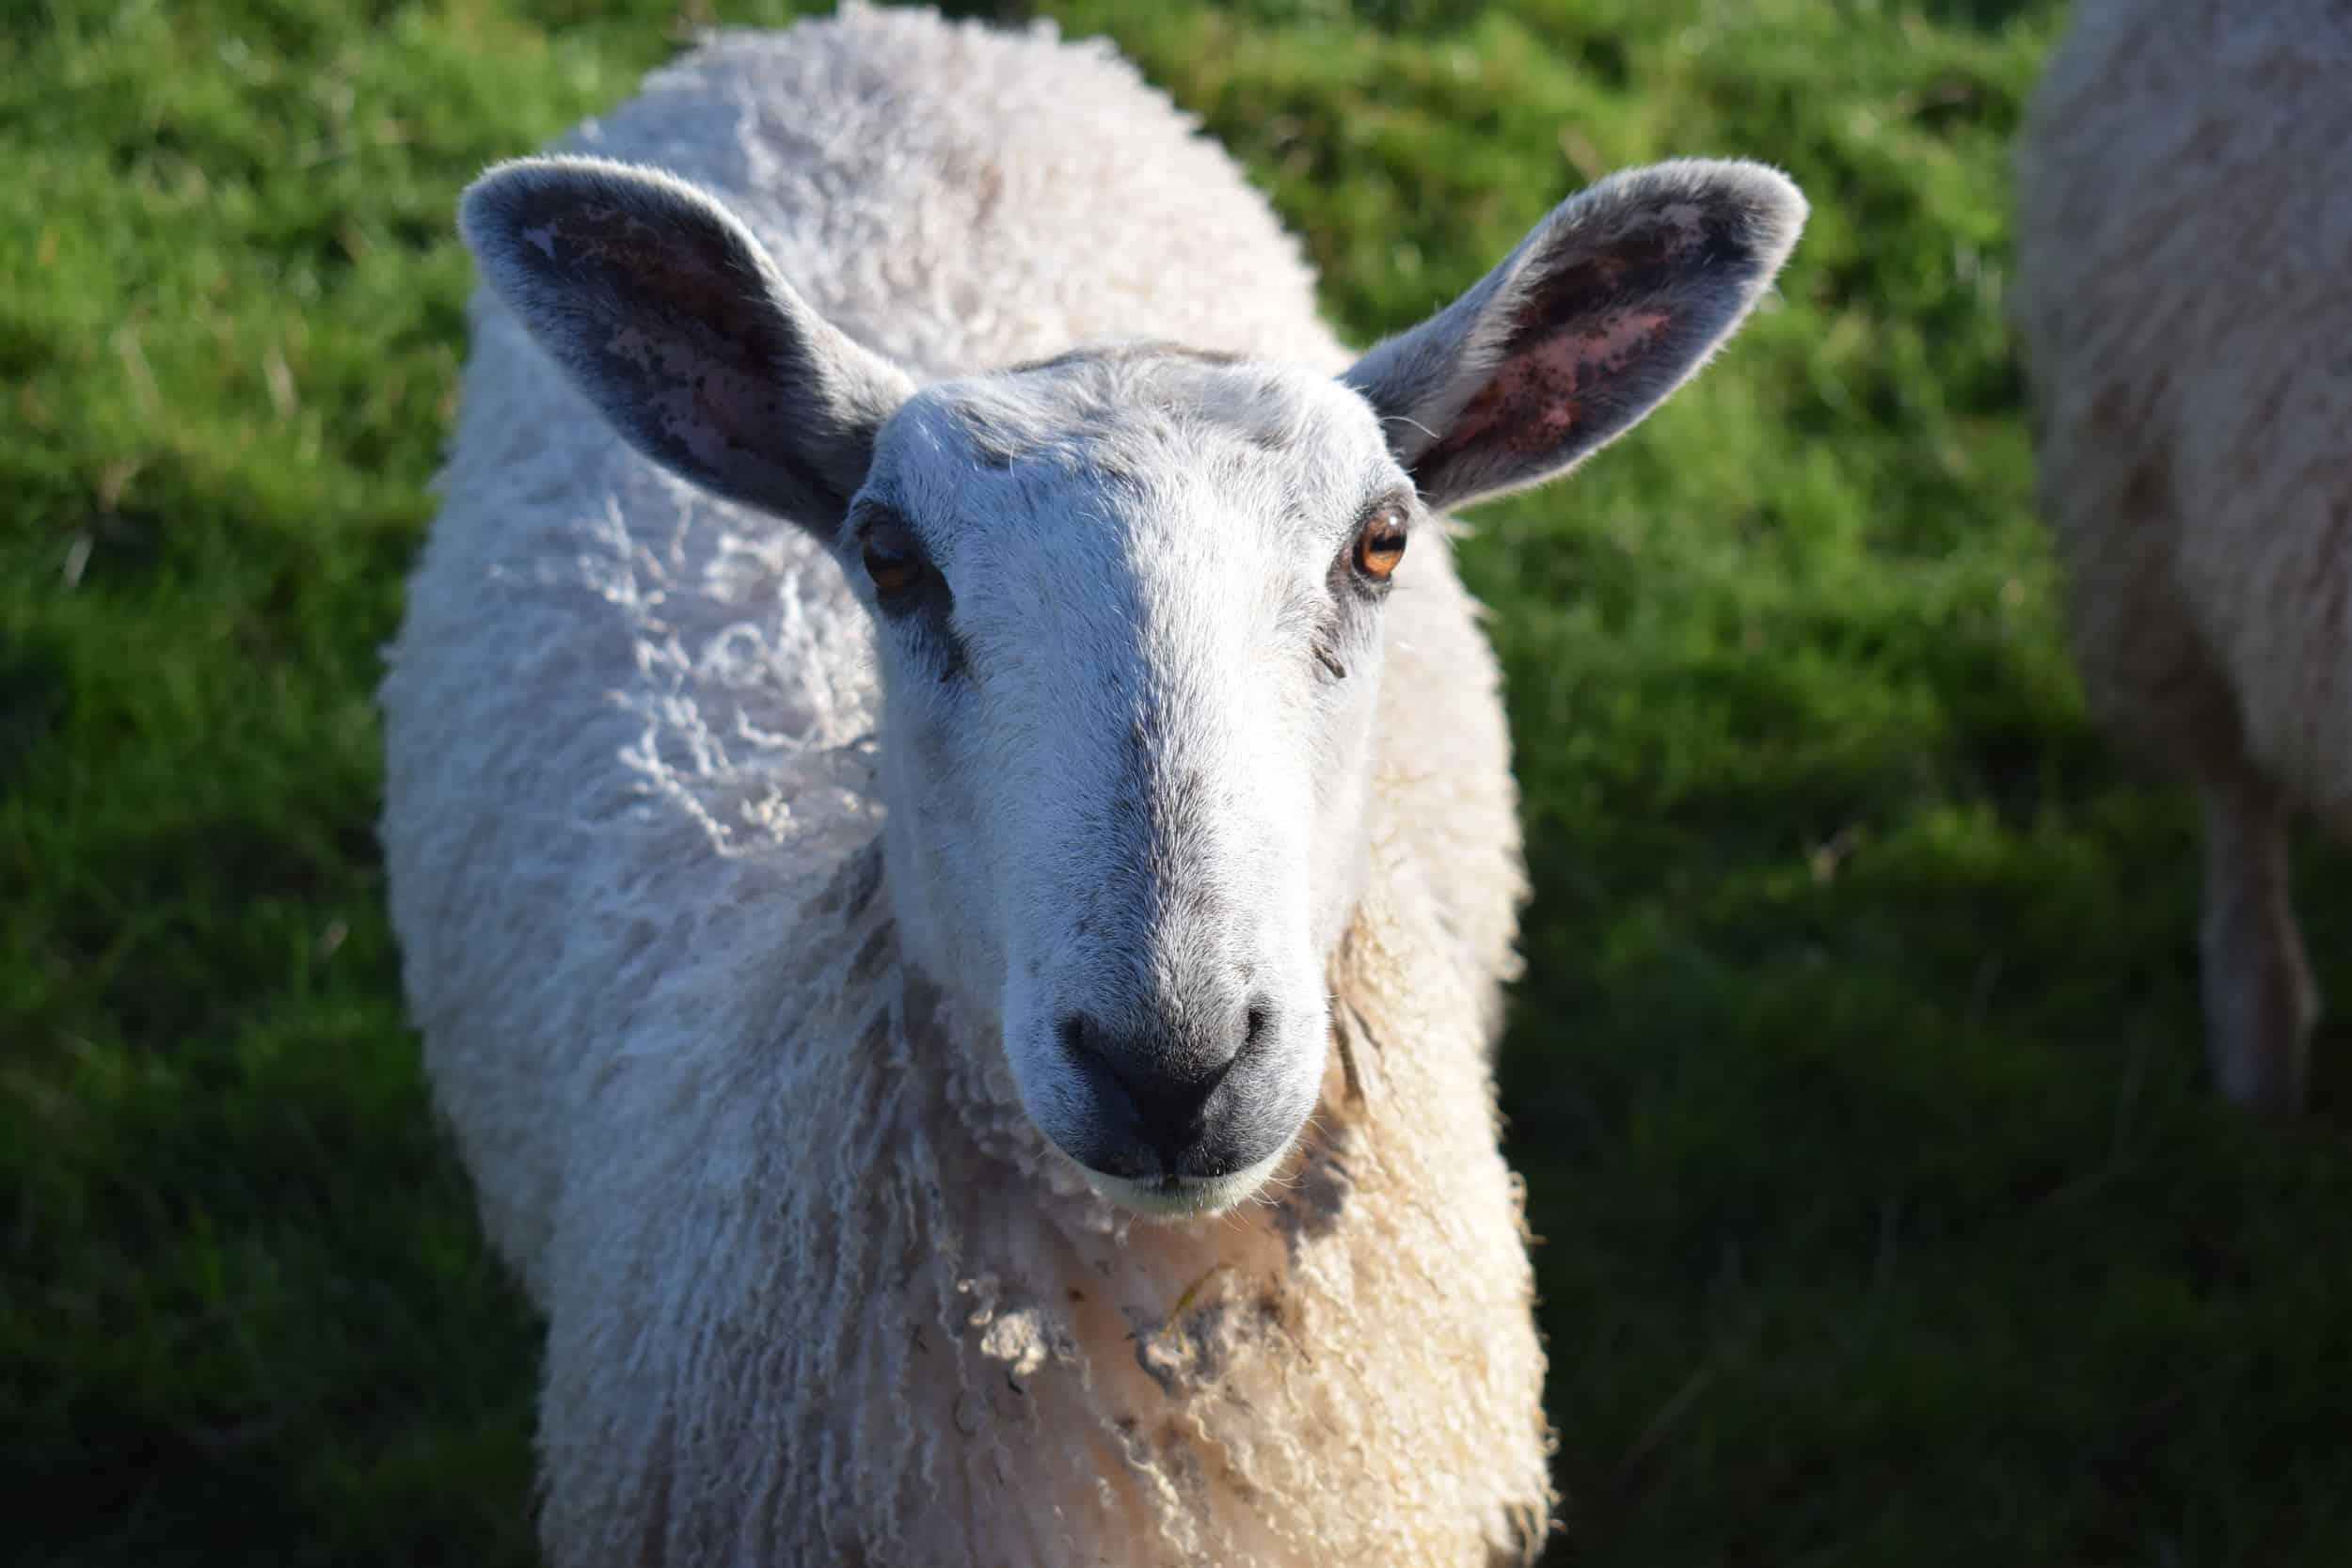 Lily bfl blueface leicester sheep ewe lamb pet bottle baby lamb